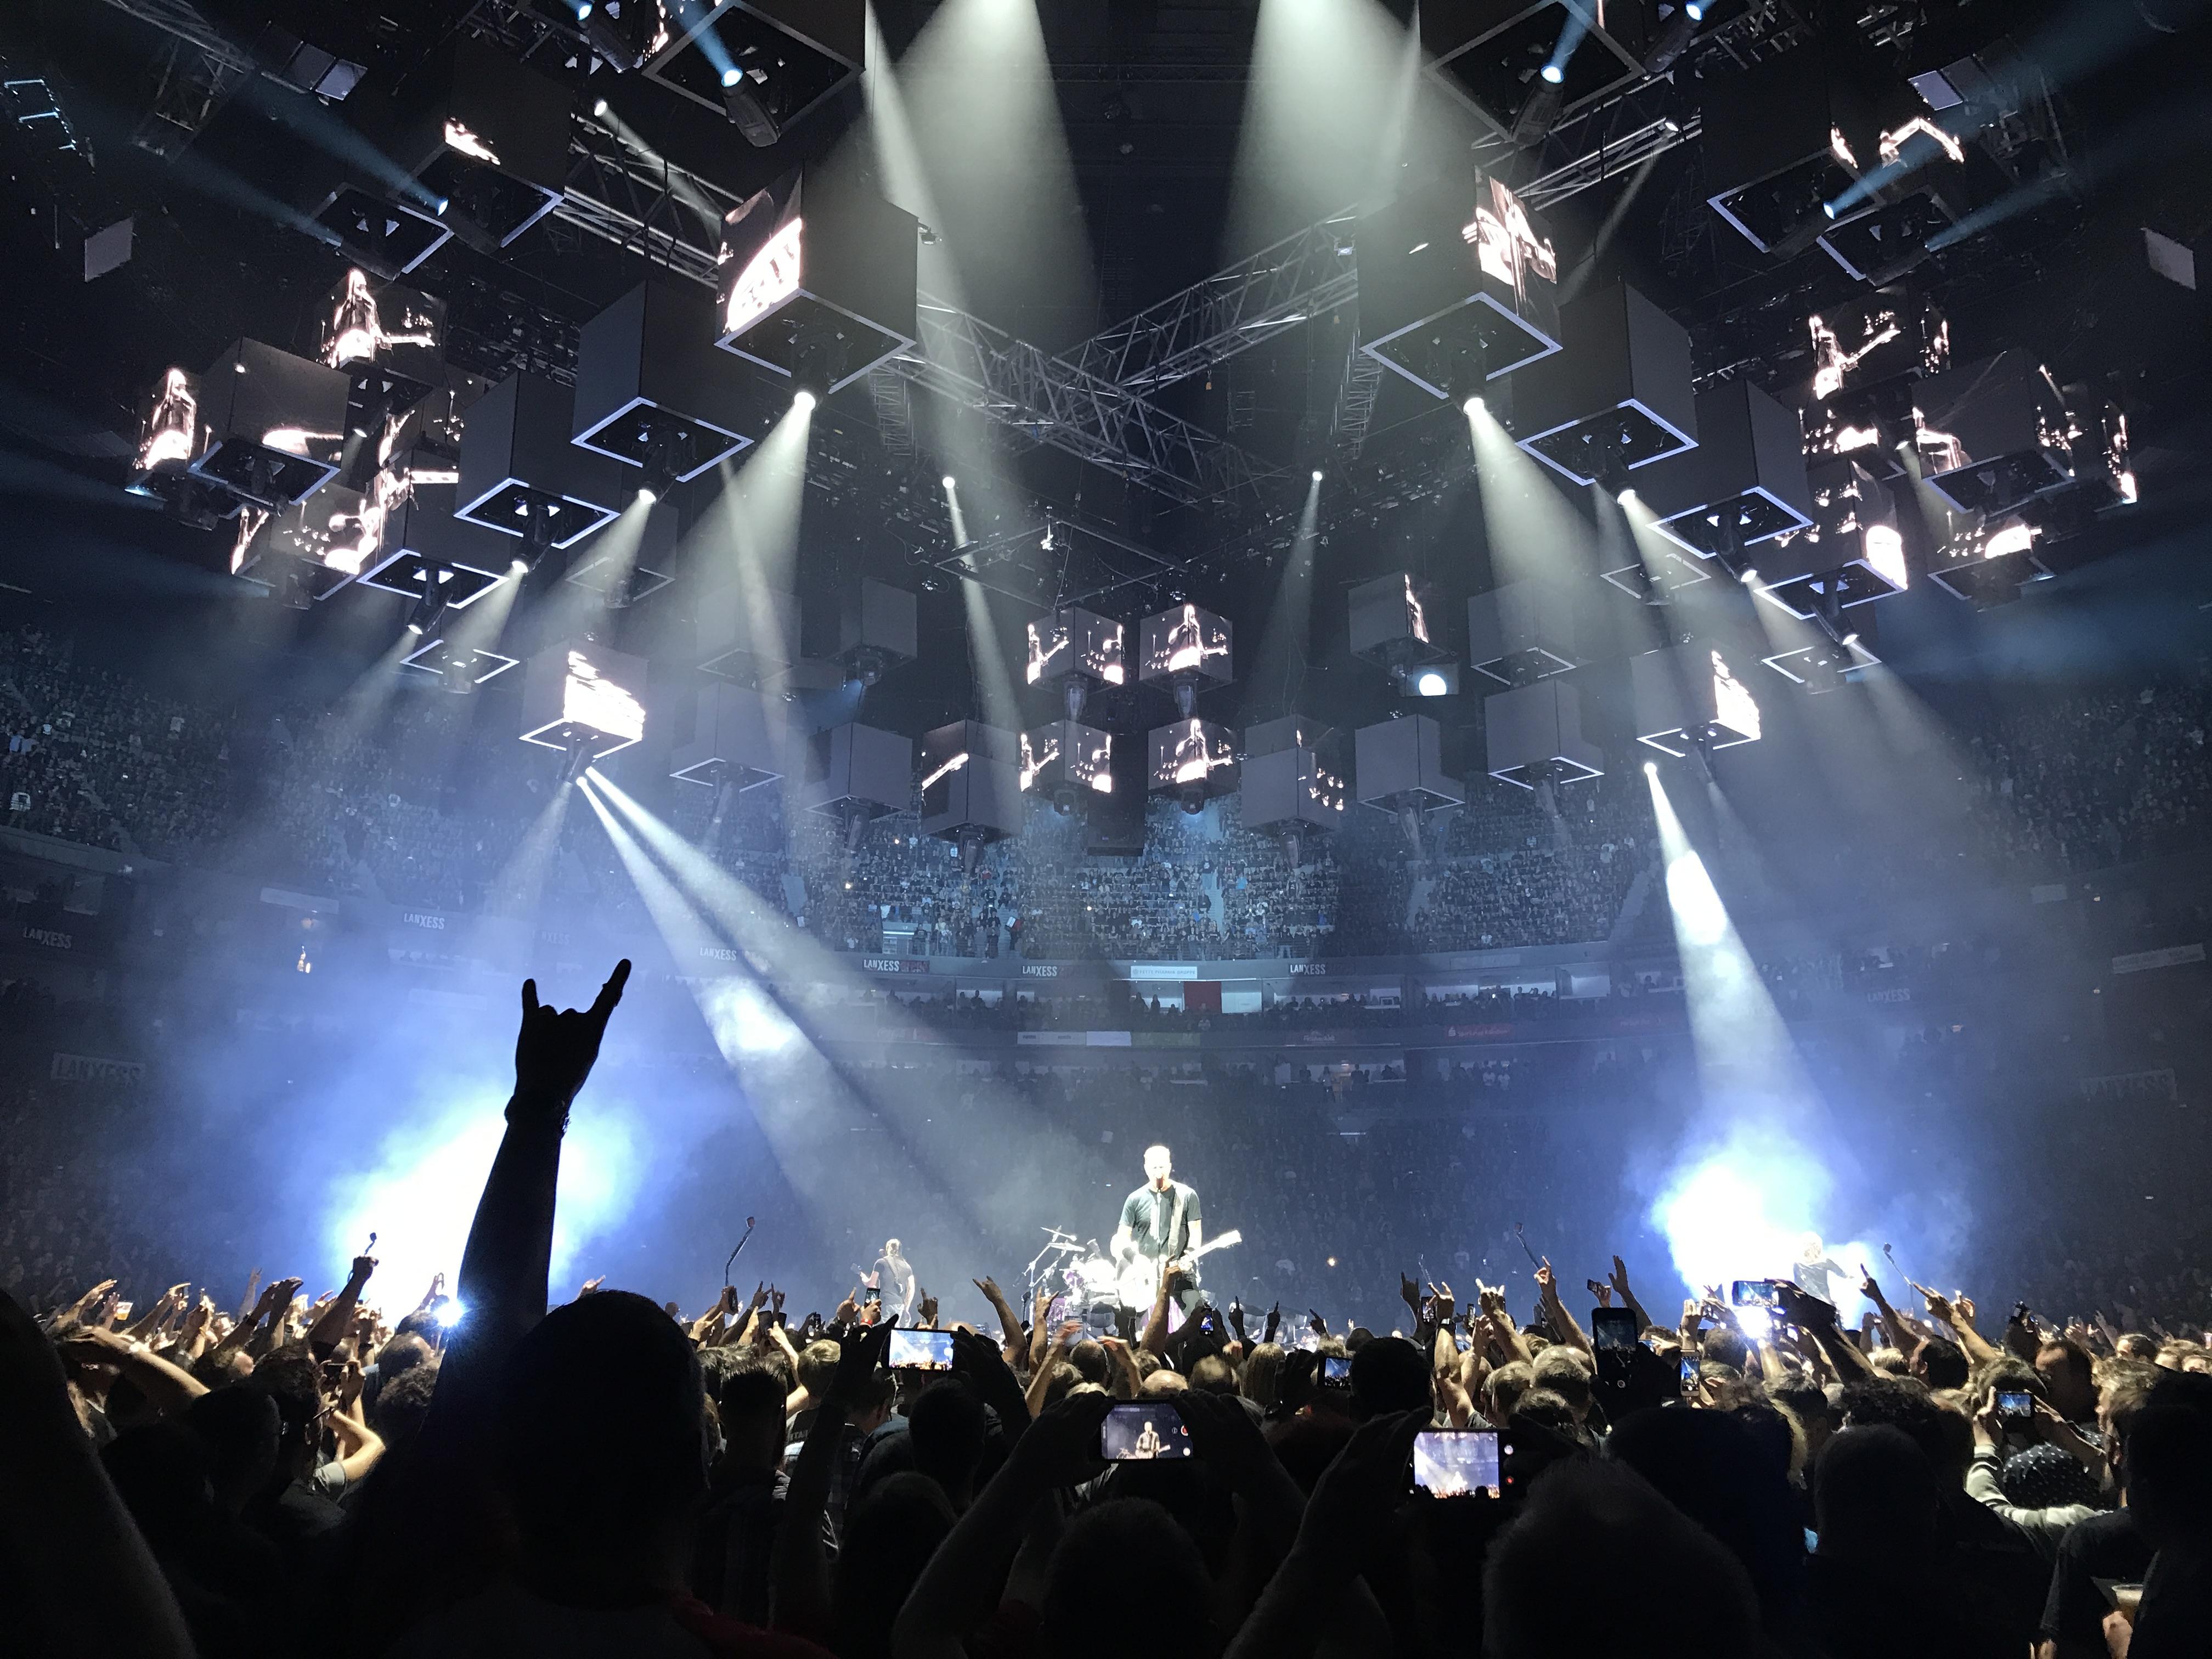 Metallica-Tribute-Band-MYTALLICA-Deutschland-Lanxess-Arena-Title